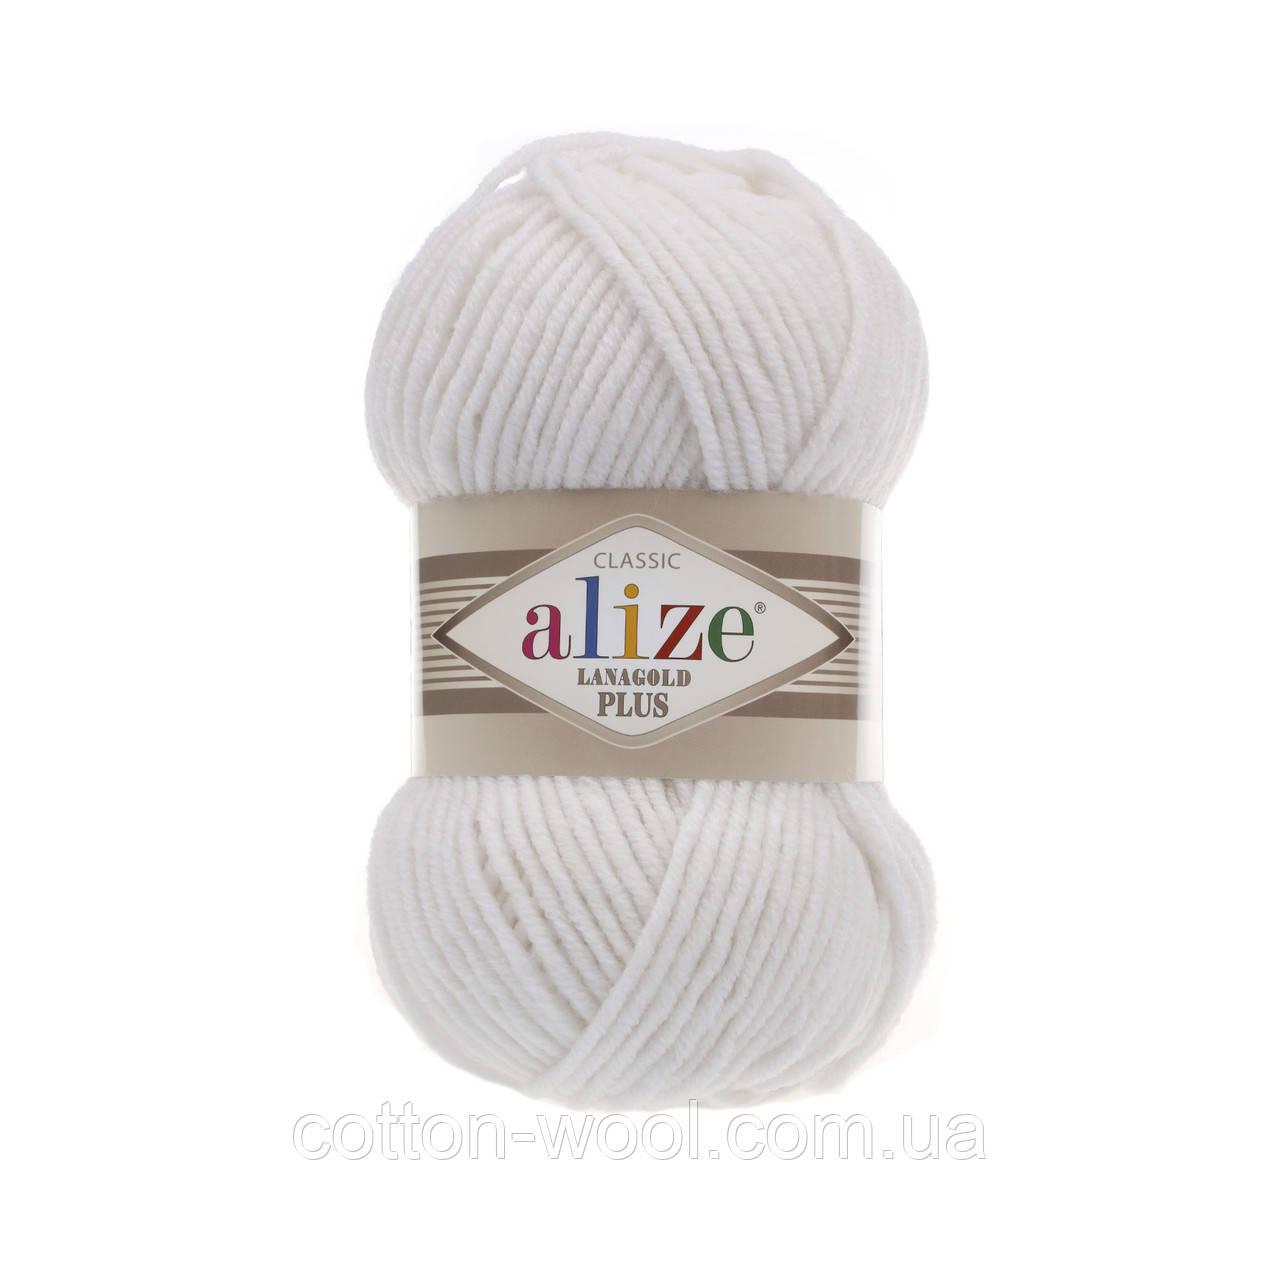 Alize Lanagold Plus (Ализе Ланаголд плюс)  55 белый